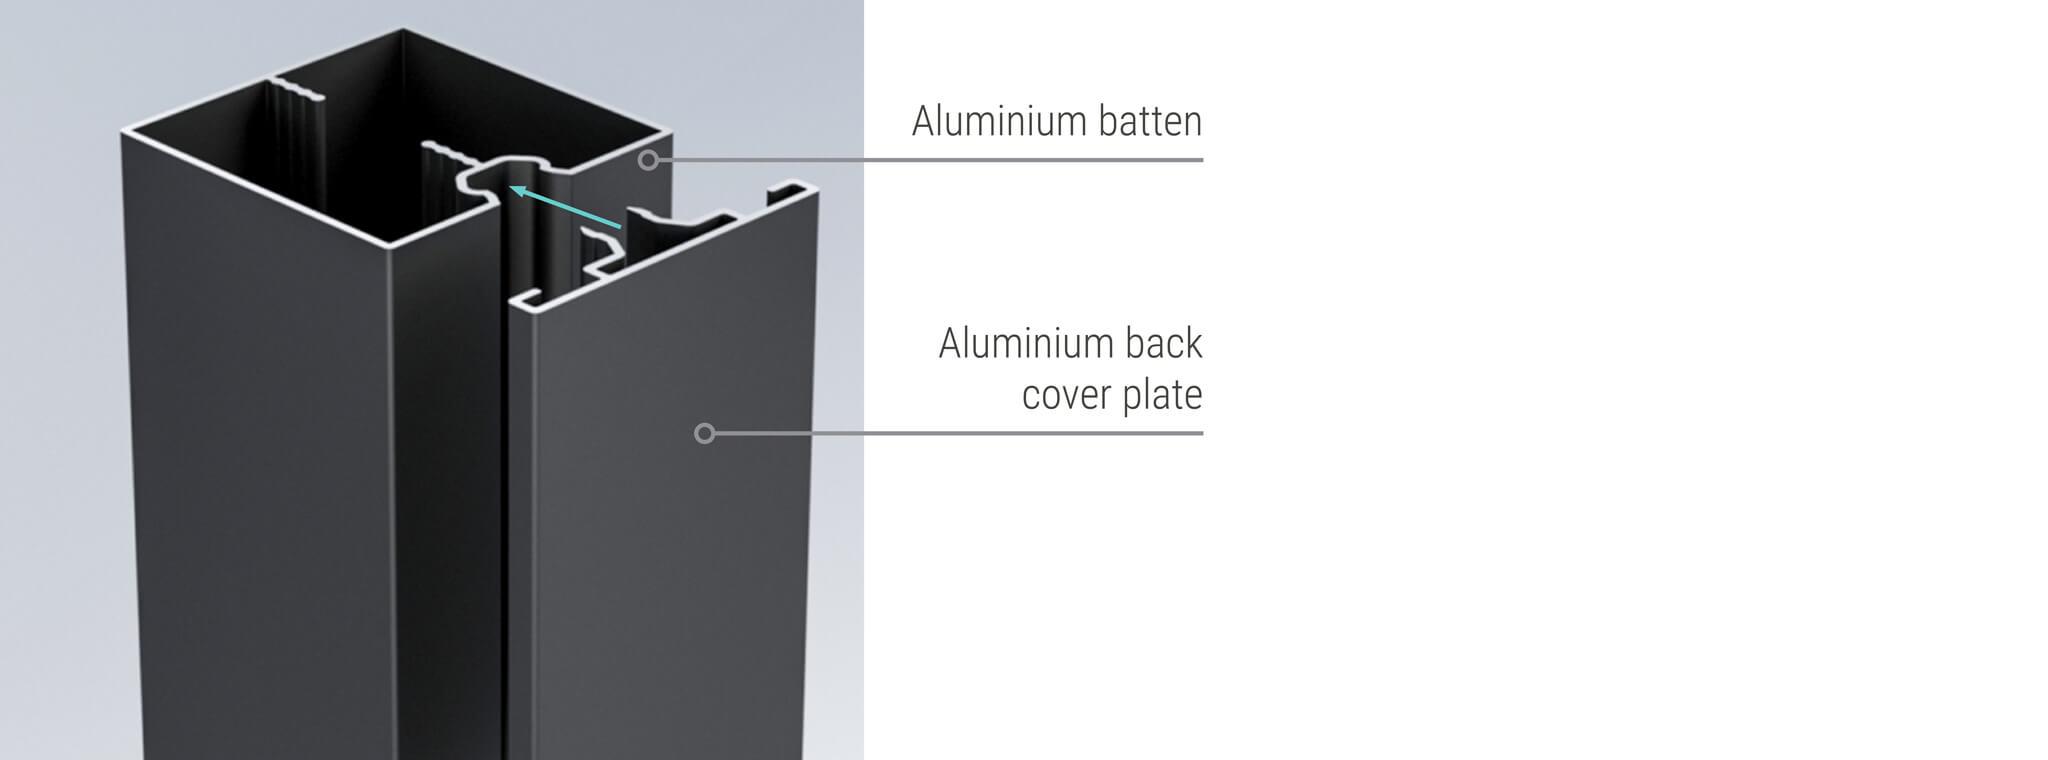 Click-on Battens Aluminium back cover plate